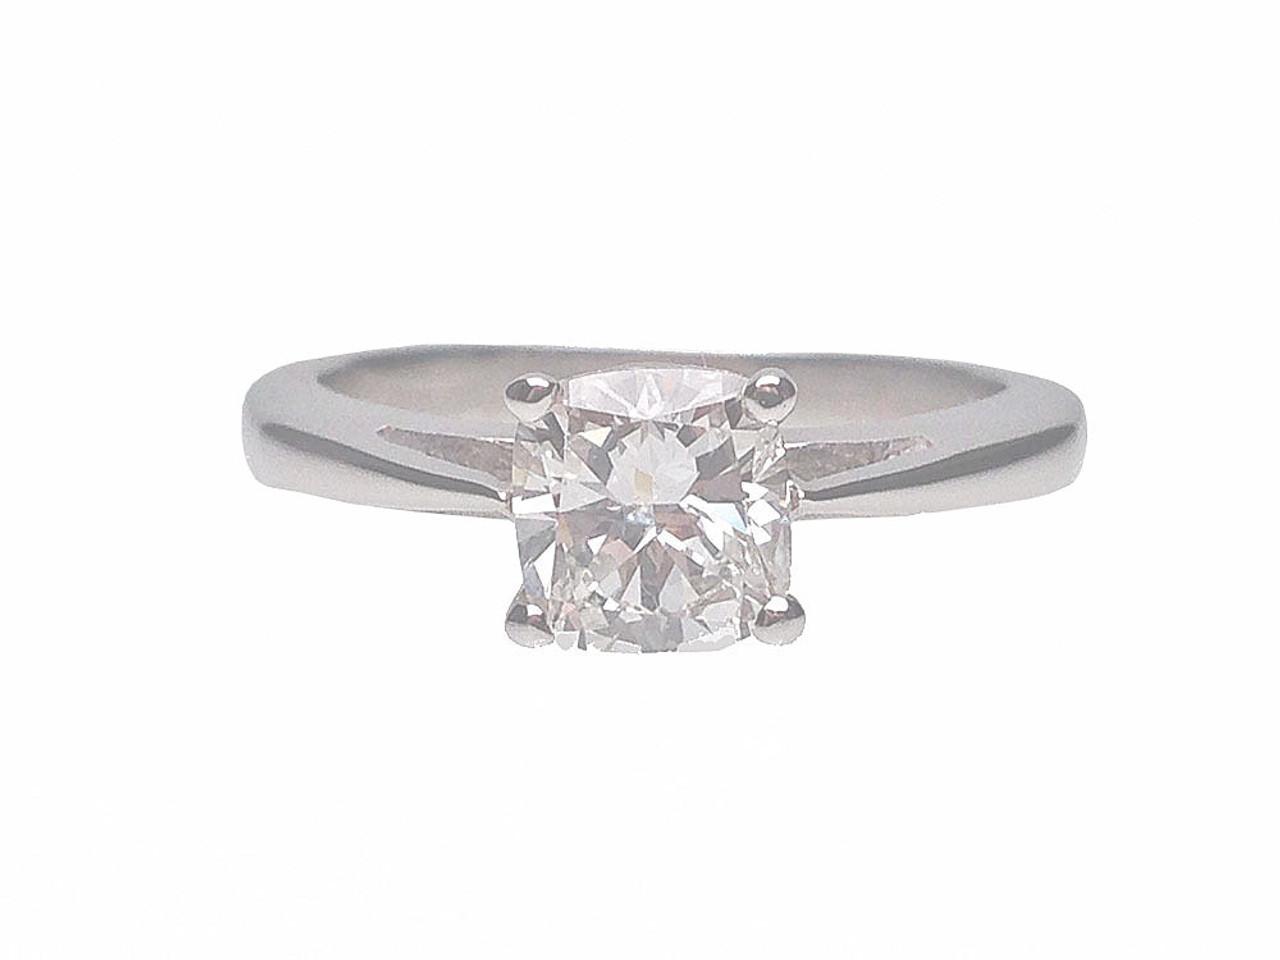 b14da854e 18 Karat White Gold Cushion Cut Solitaire Diamond Engagement Ring ...